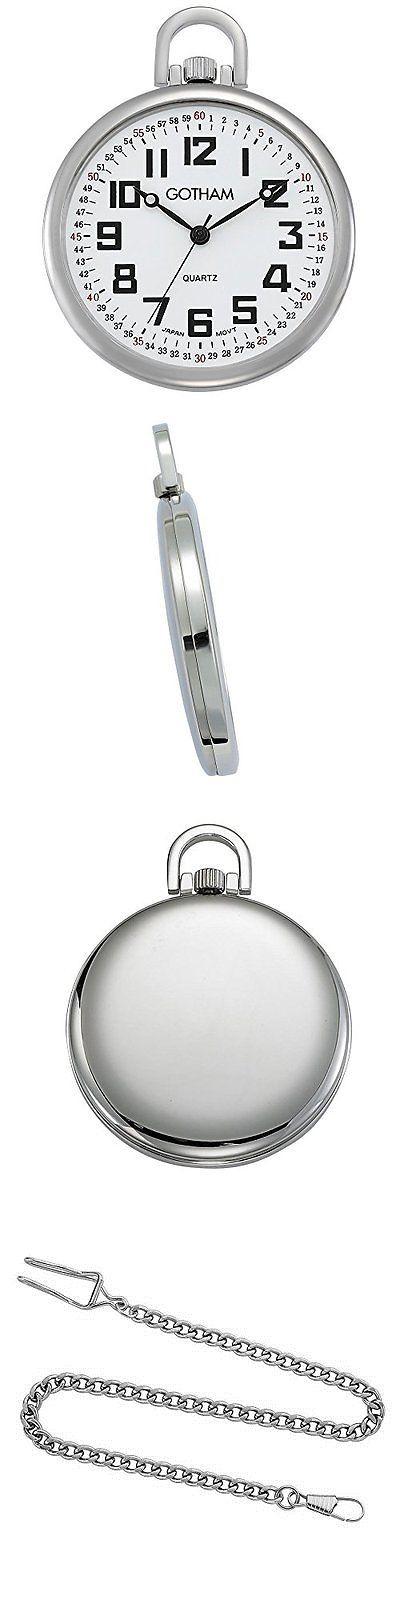 Modern 3938: Gotham Men S Silver-Tone Ultra Thin Railroad Open Face Quartz Pocket Watch # -> BUY IT NOW ONLY: $51.05 on eBay!